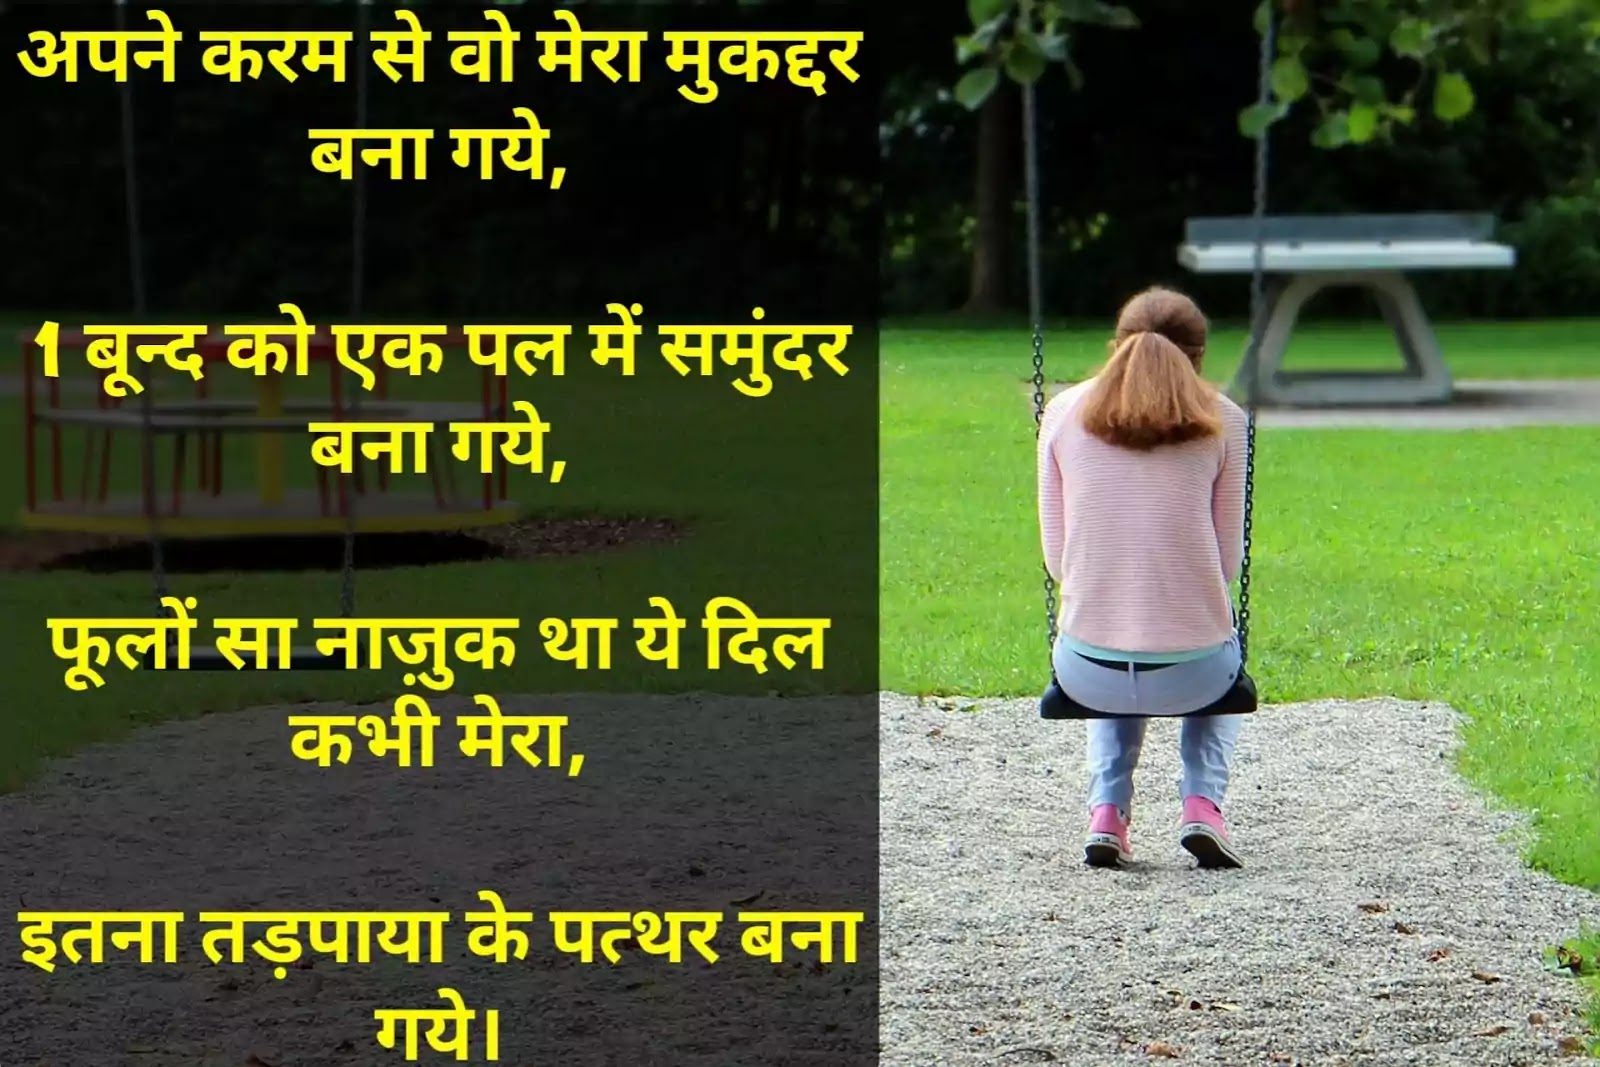 Dard bhari shayari Hindi photo